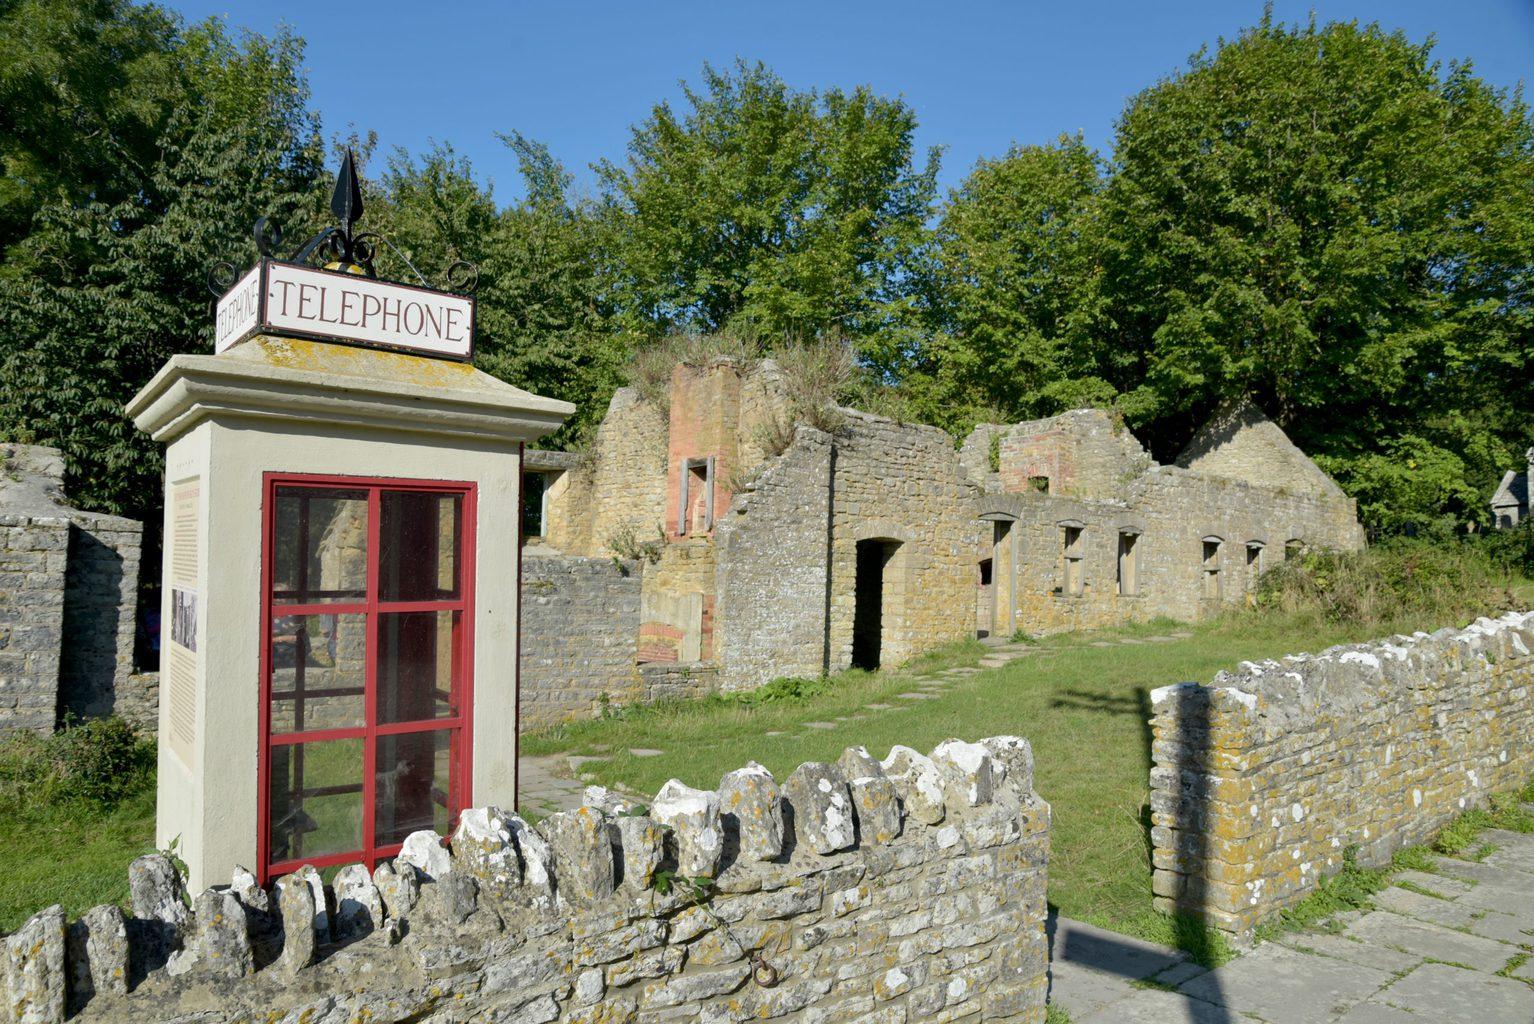 Dorset Museum's wtih Virtual Tours